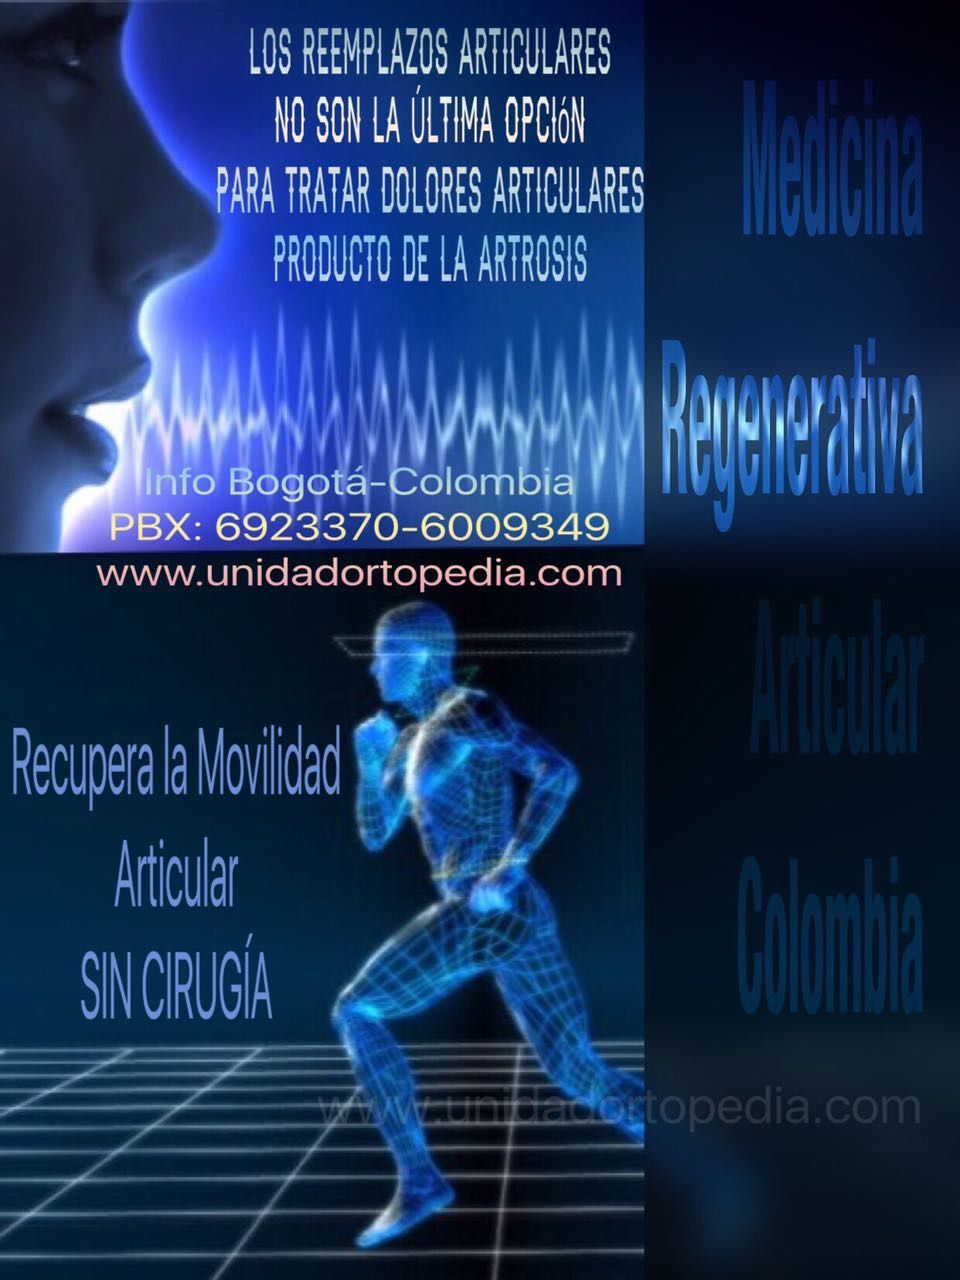 49ee0c874beac781551327385b2be3cb Viagra Sin Medica Bogota on